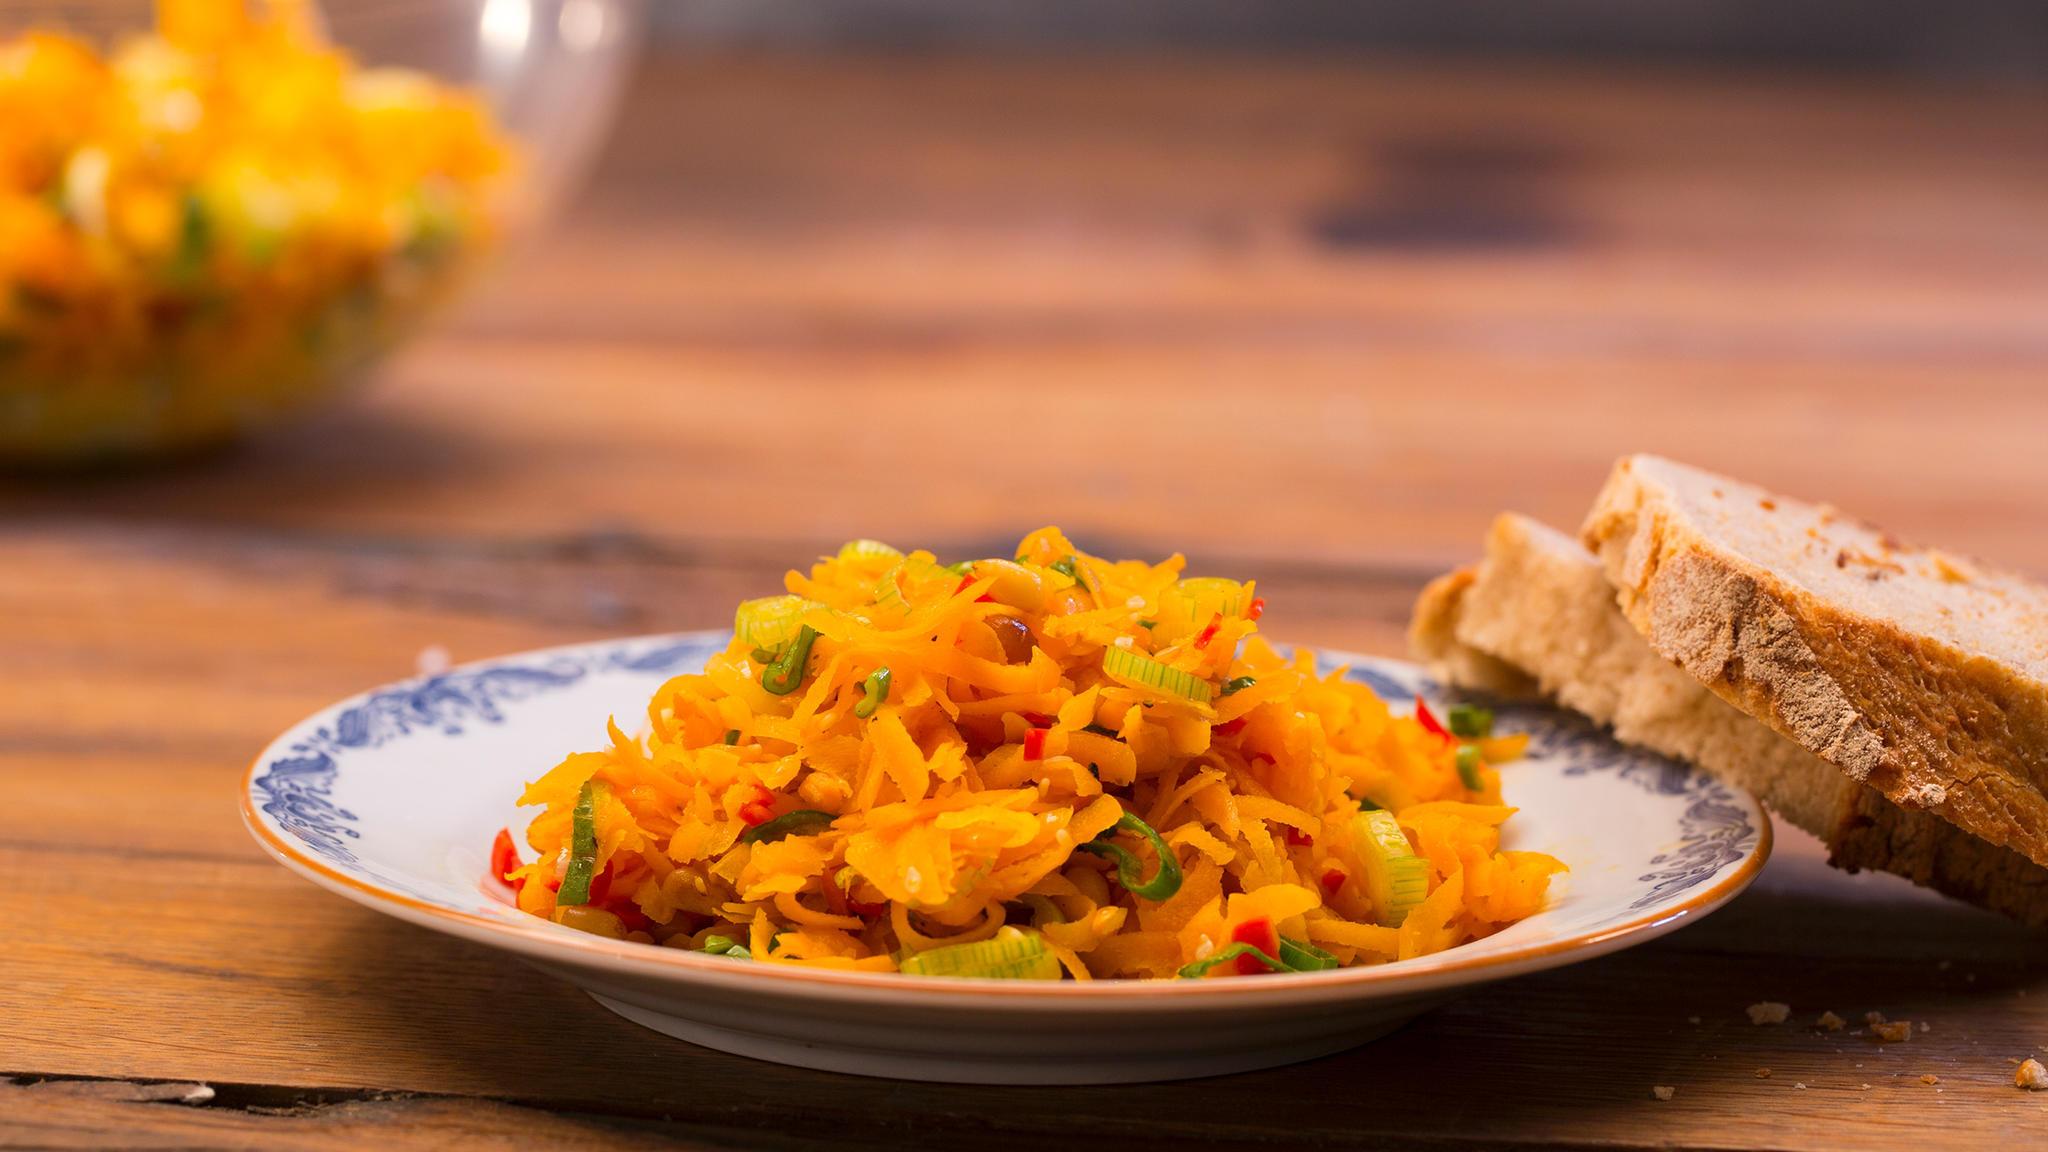 Bayerische Sommerküche : Rezept für pikanten möhrensalat stern.de